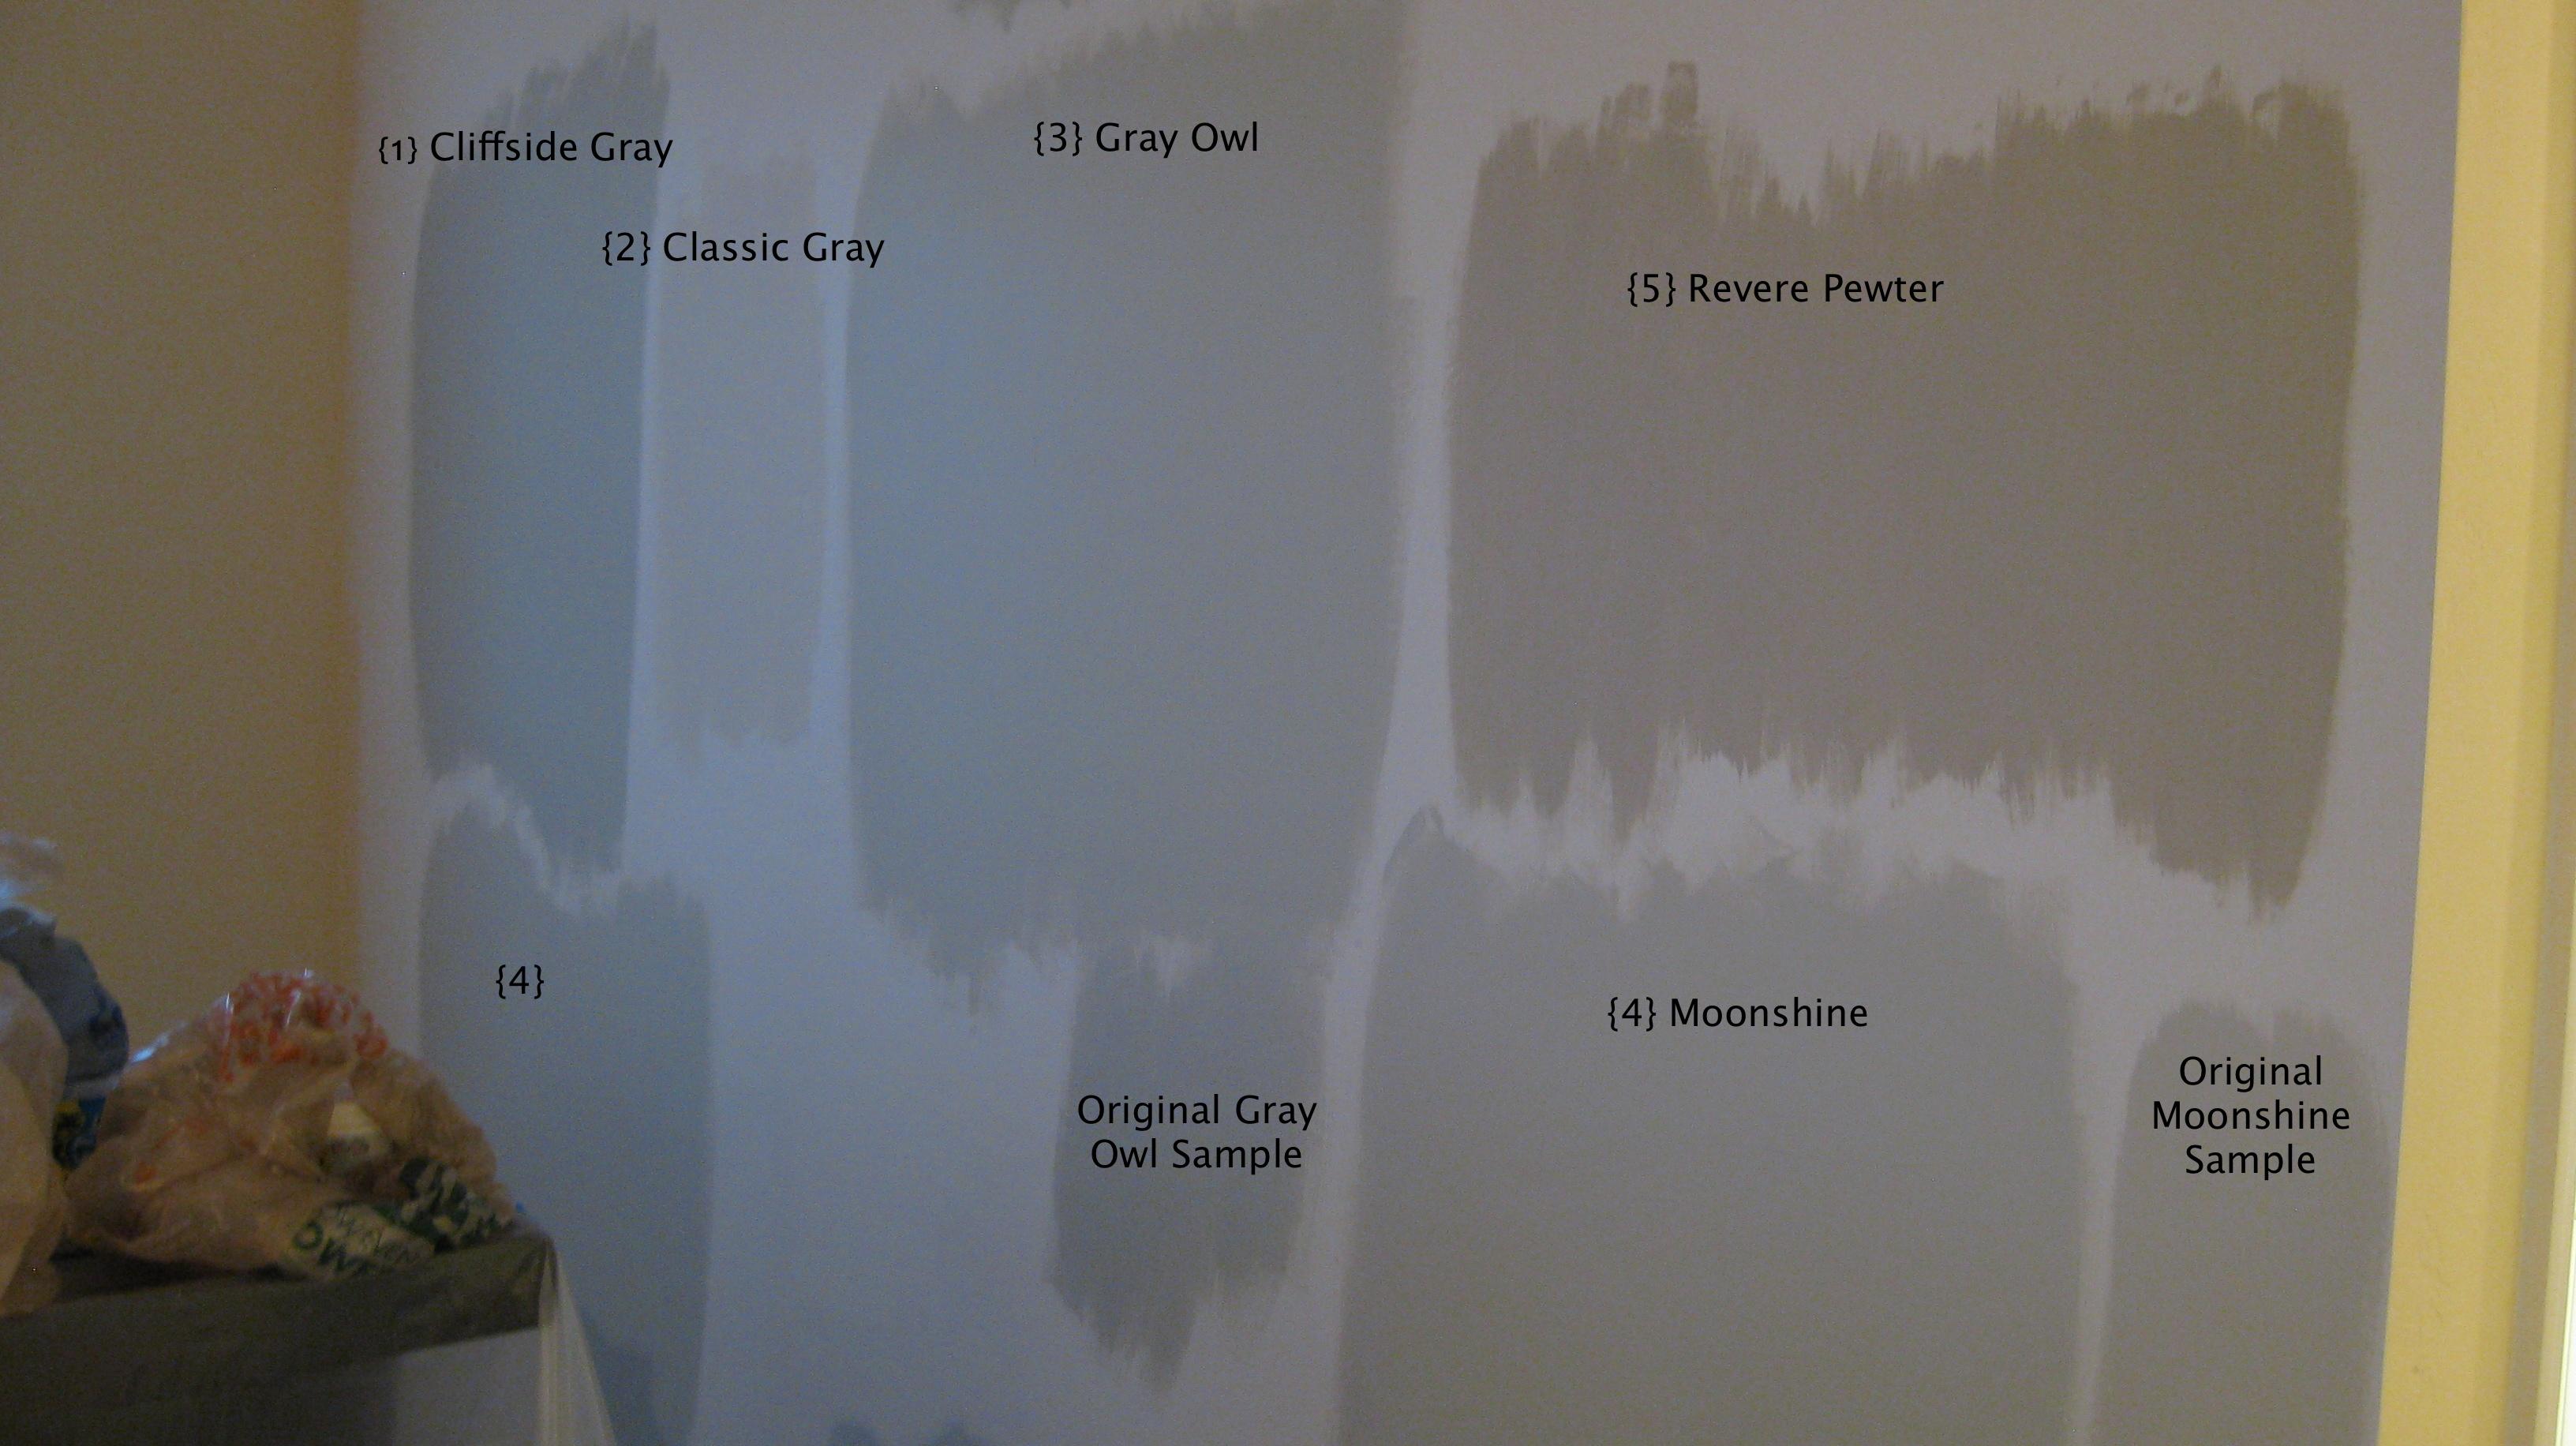 Martha Stewart Bedroom Paint Colors Interior Updates Get Careyd Away Page 2